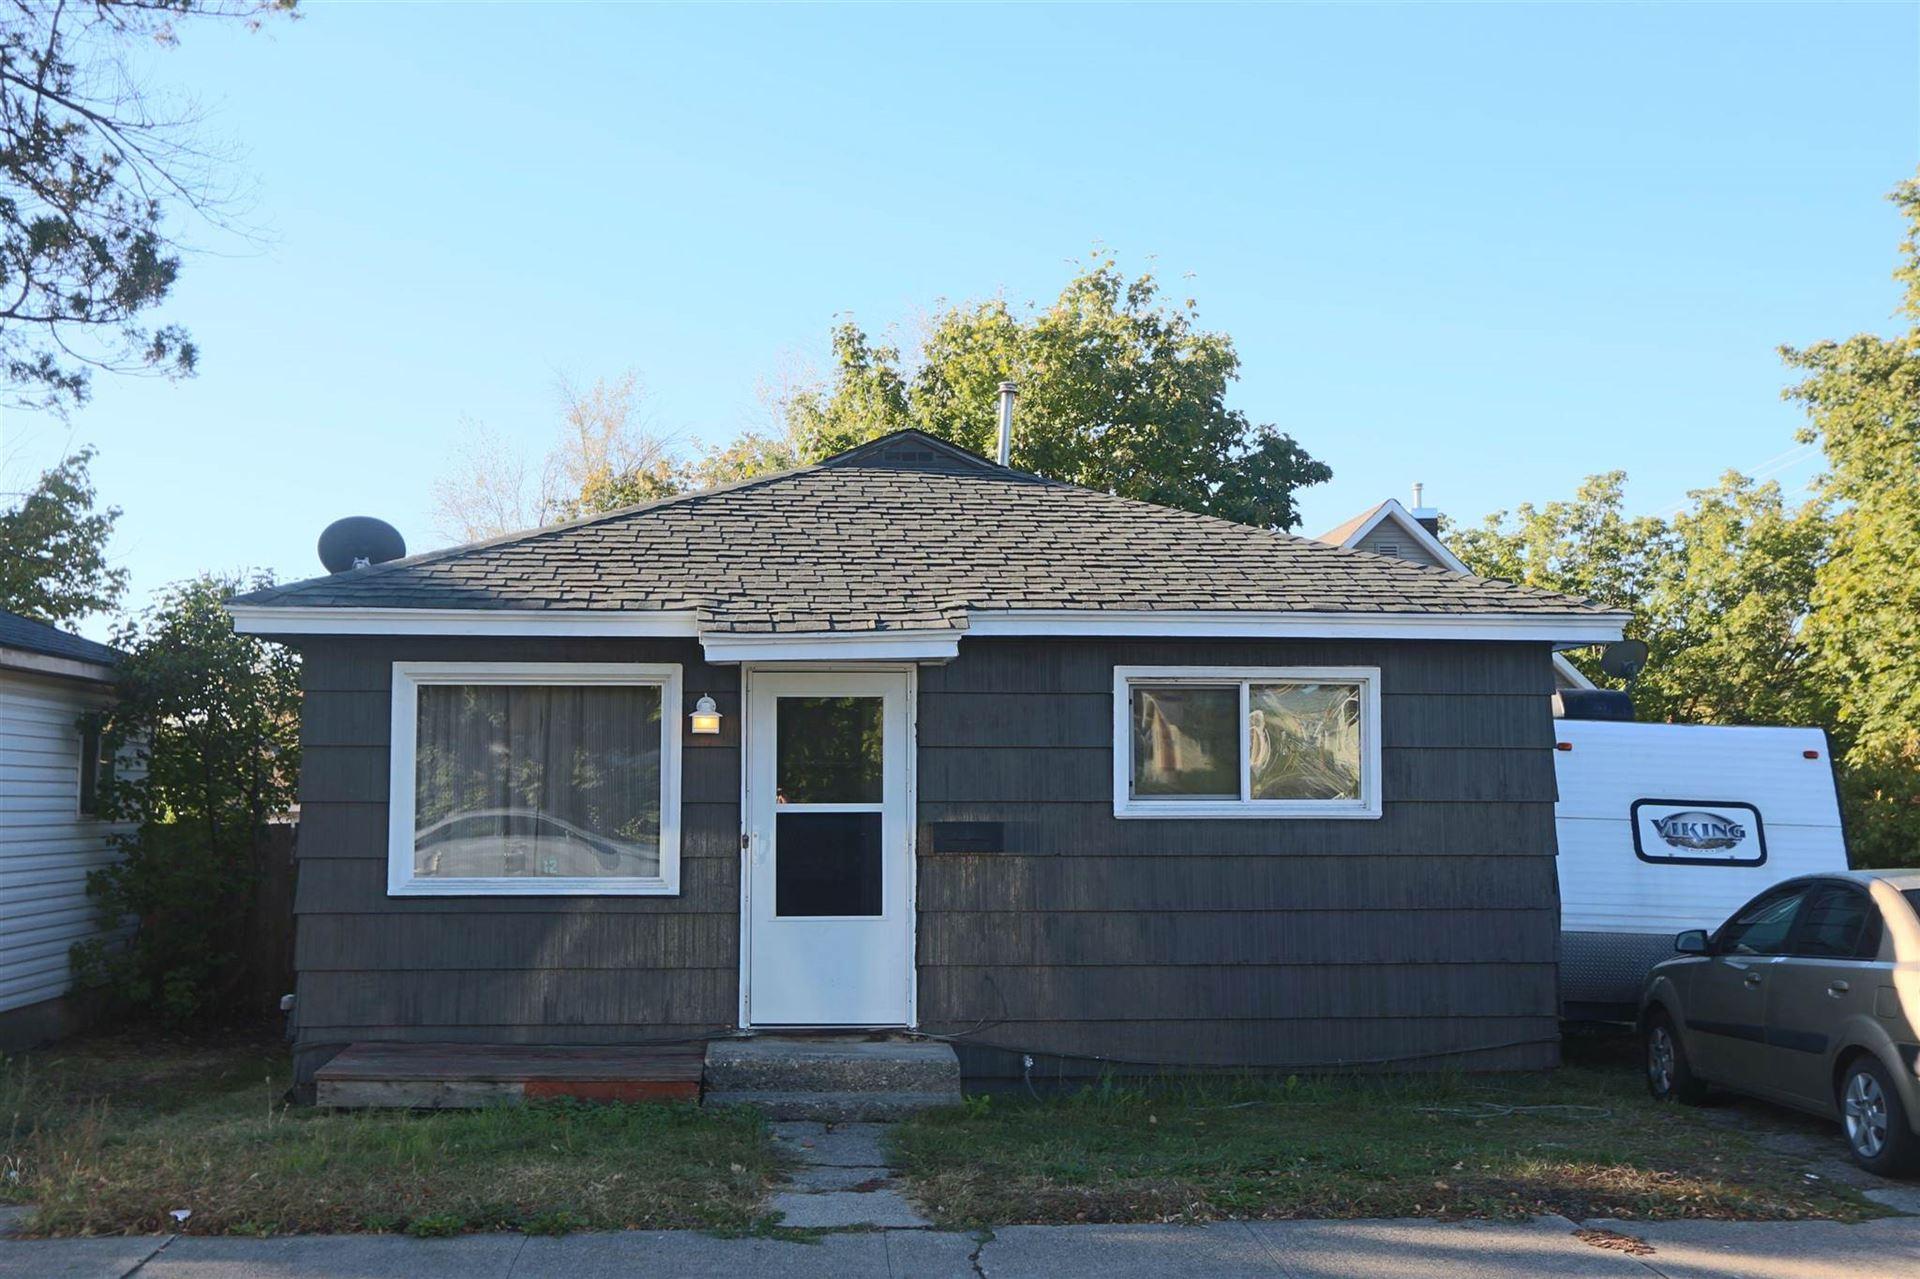 808 E Euclid Ave, Spokane, WA 99207 - #: 202122680